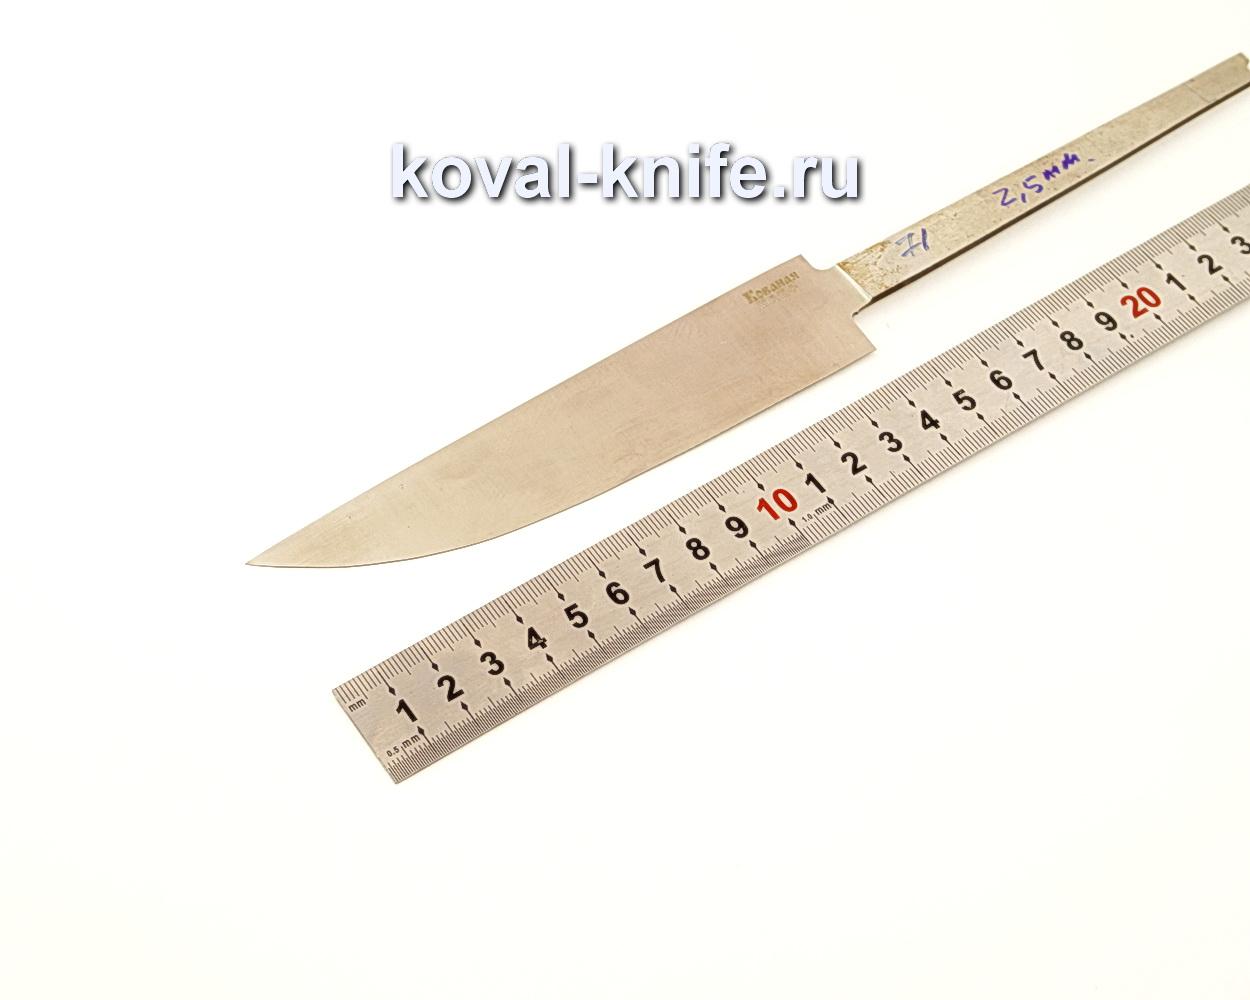 Клинок для ножа из кованой стали Х12МФ N71